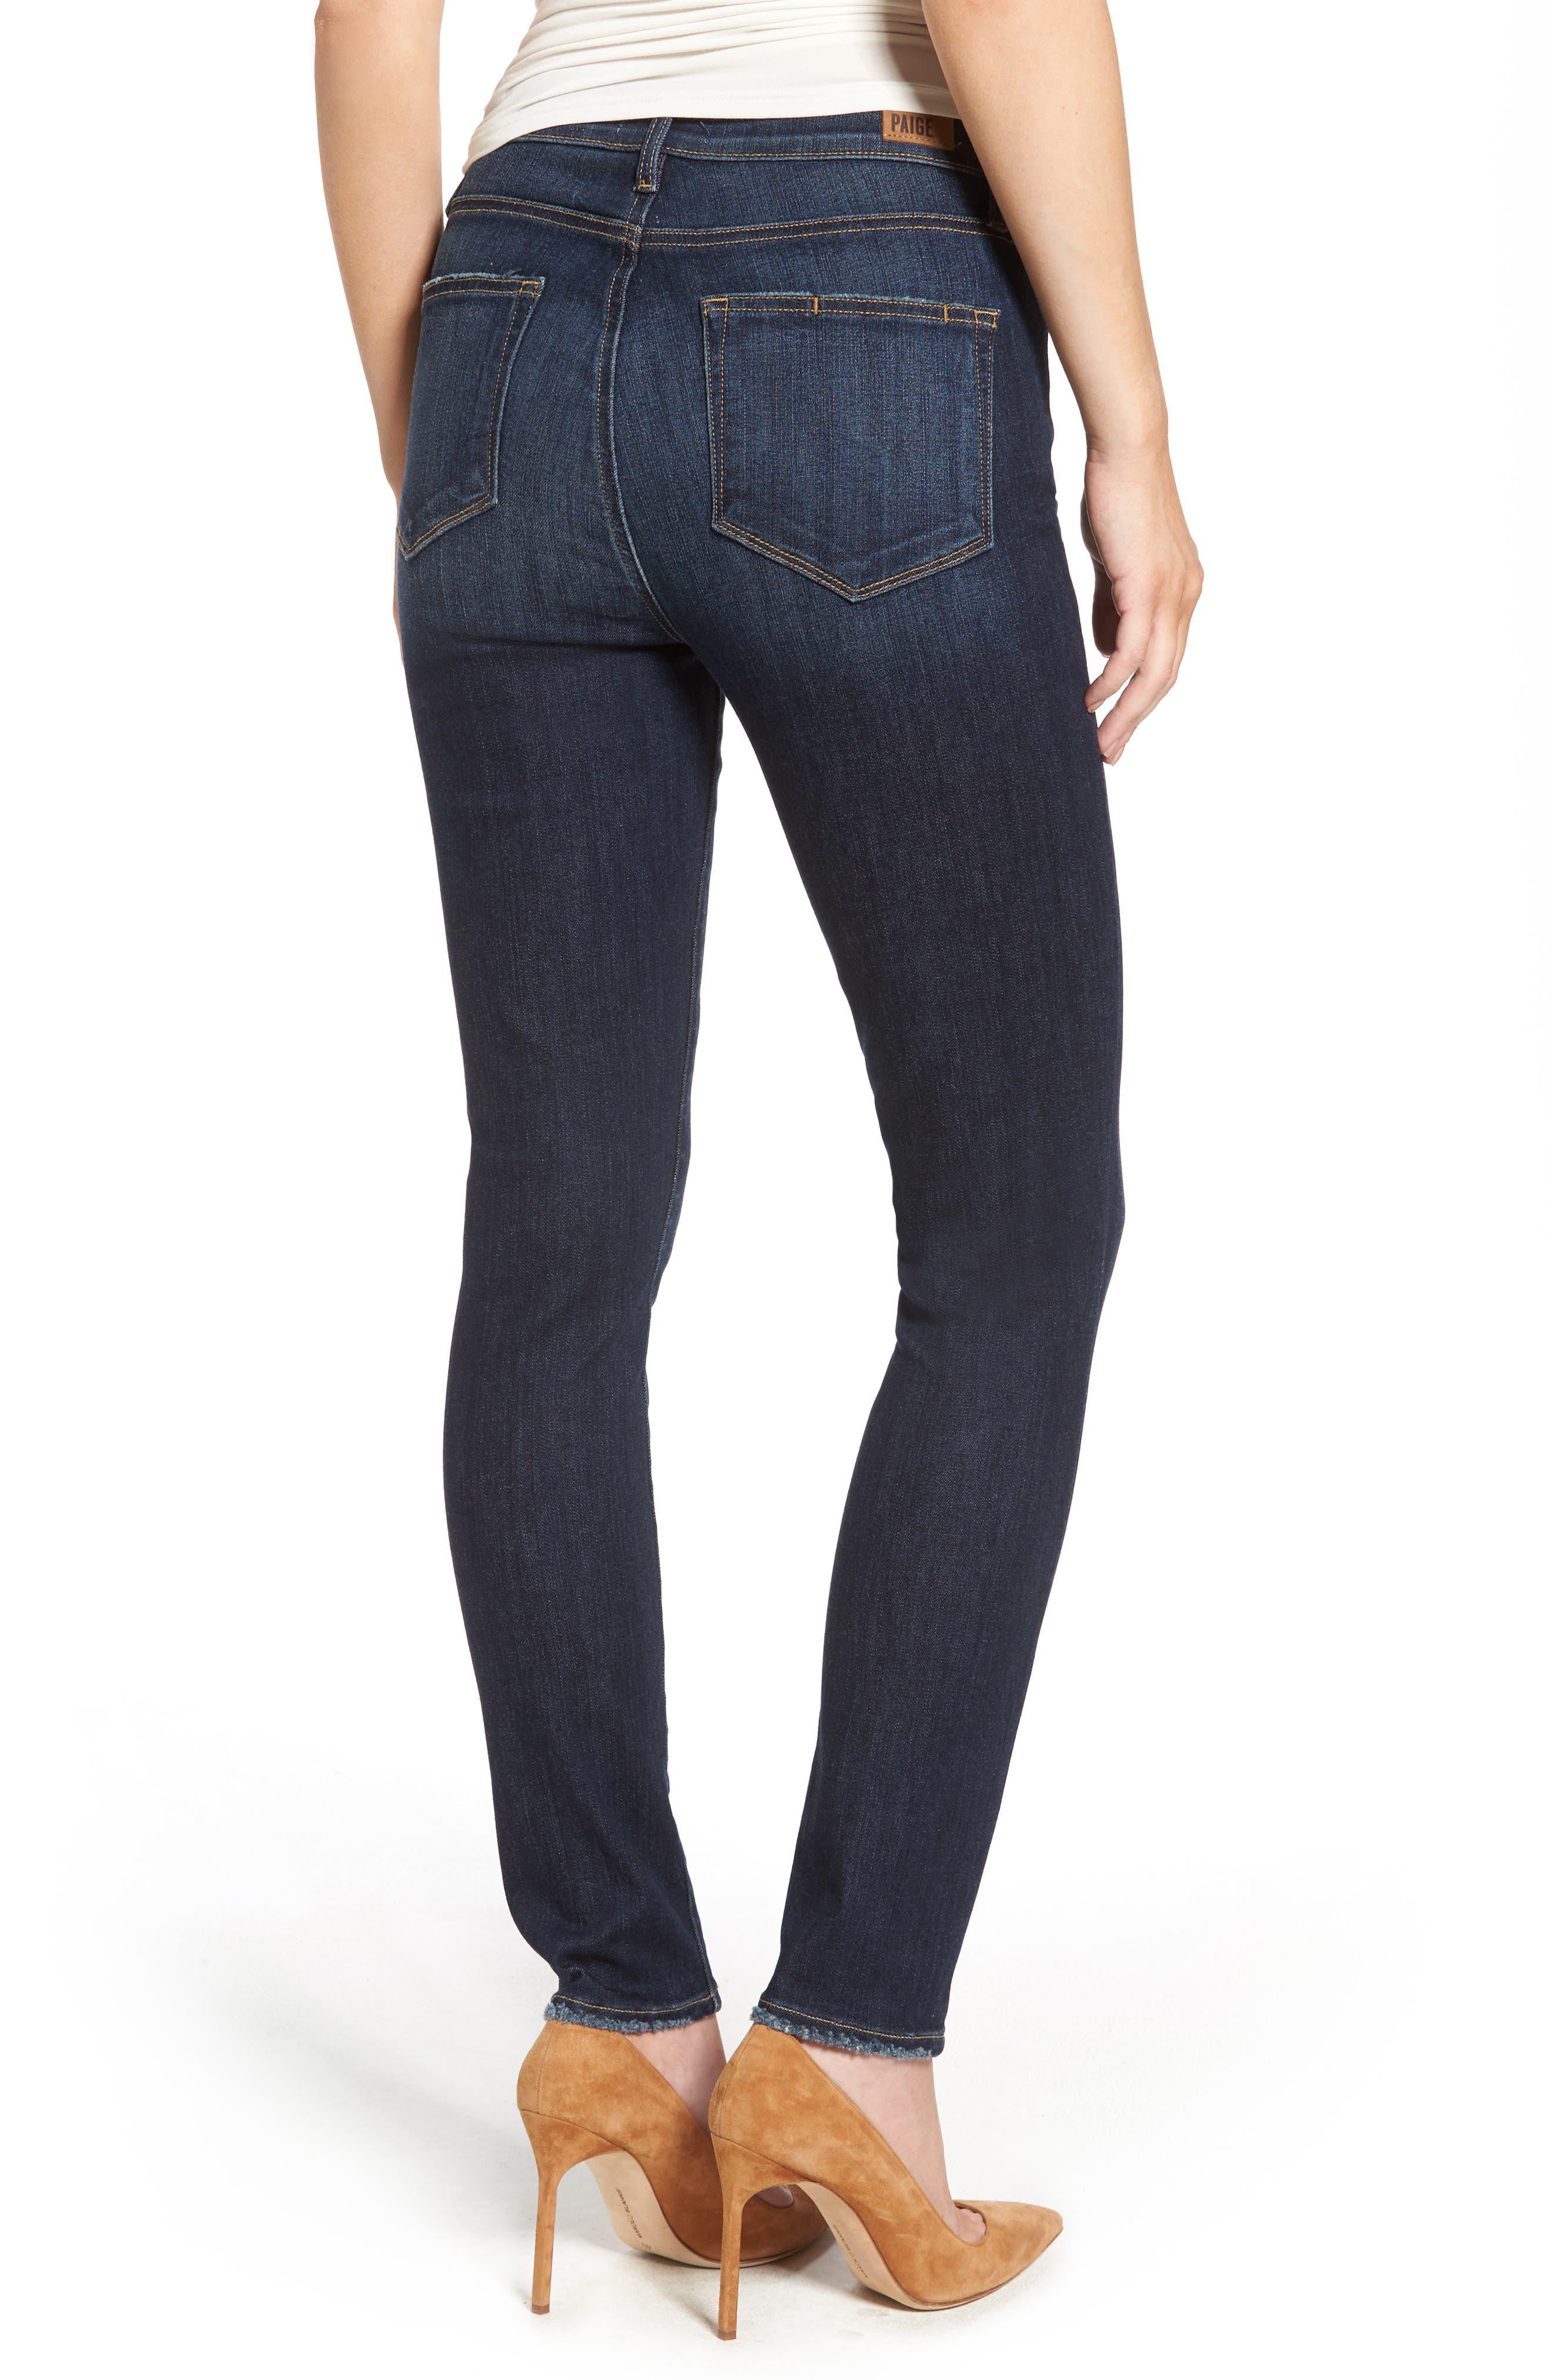 Alternate Image 2  - PAIGE Hoxton High Waist Ankle Skinny Jeans (Revere)